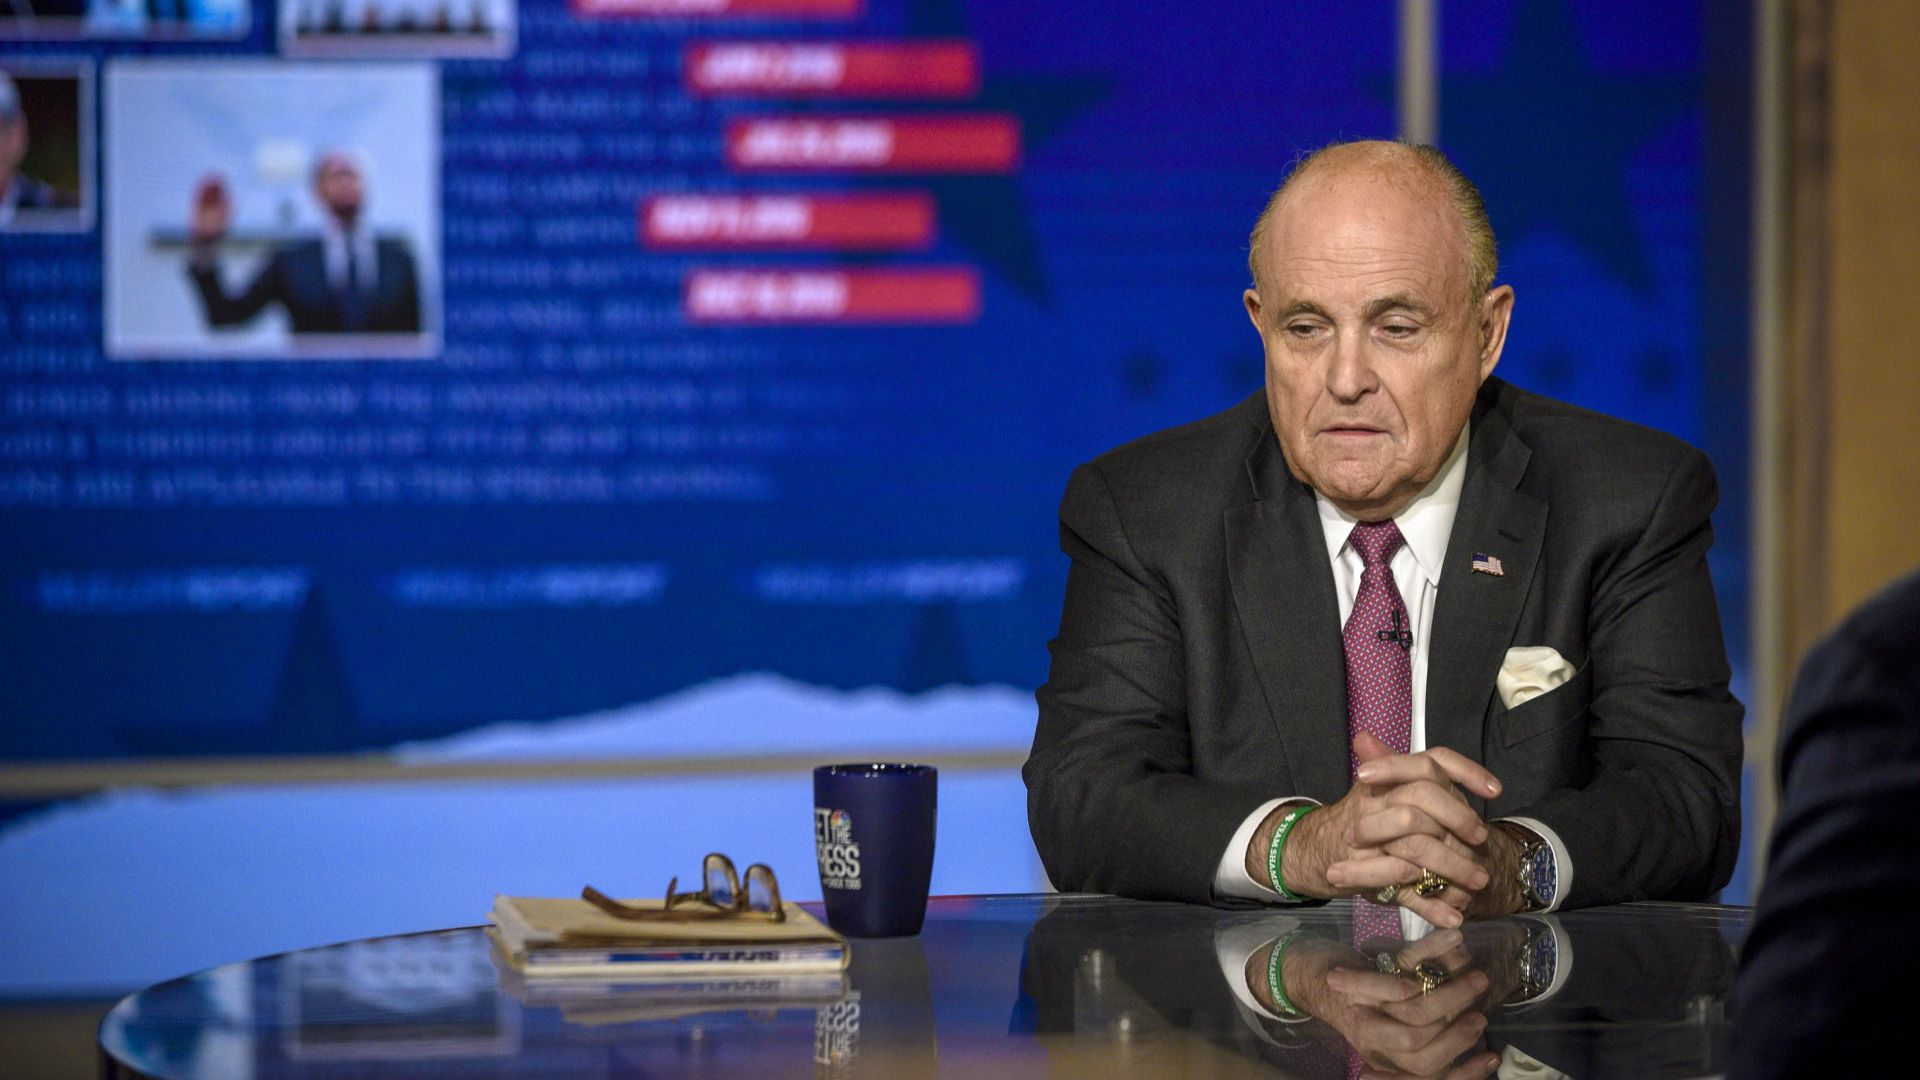 Rudy Giuliani's Ukraine work puts him at the center of the House's Trump impeachment inquiry